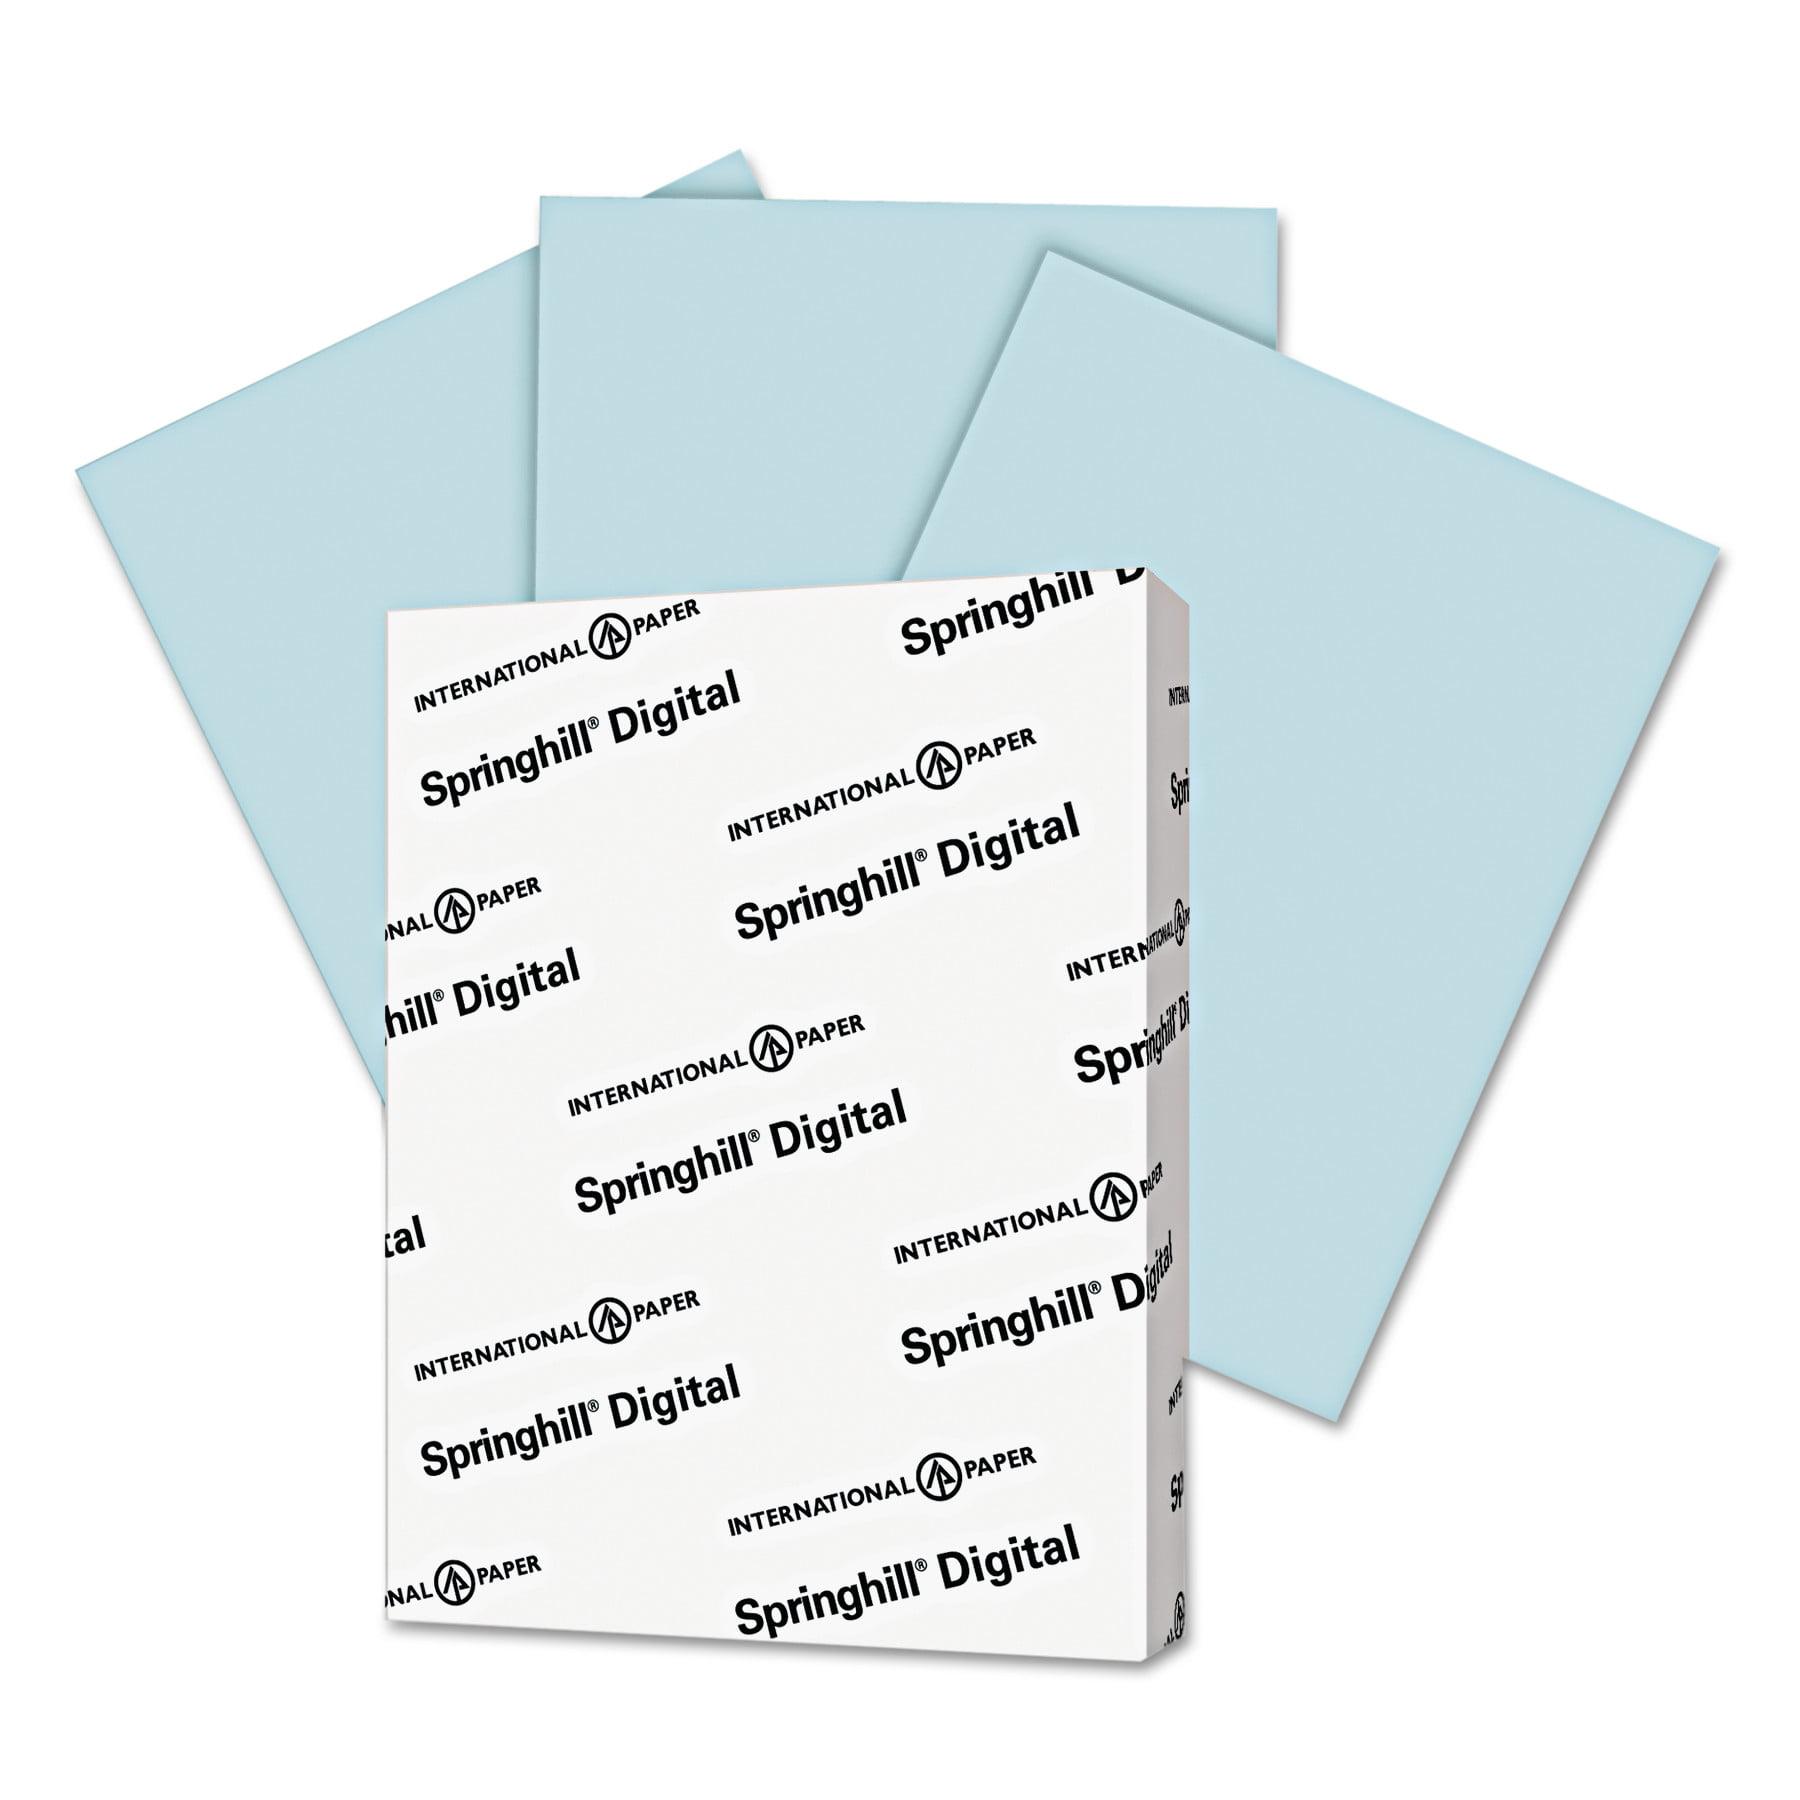 Springhill Digital Vellum Bristol Color Cover, 67 lb, 8 1/2 x 11, Blue, 250 Sheets/Pack -SGH026000